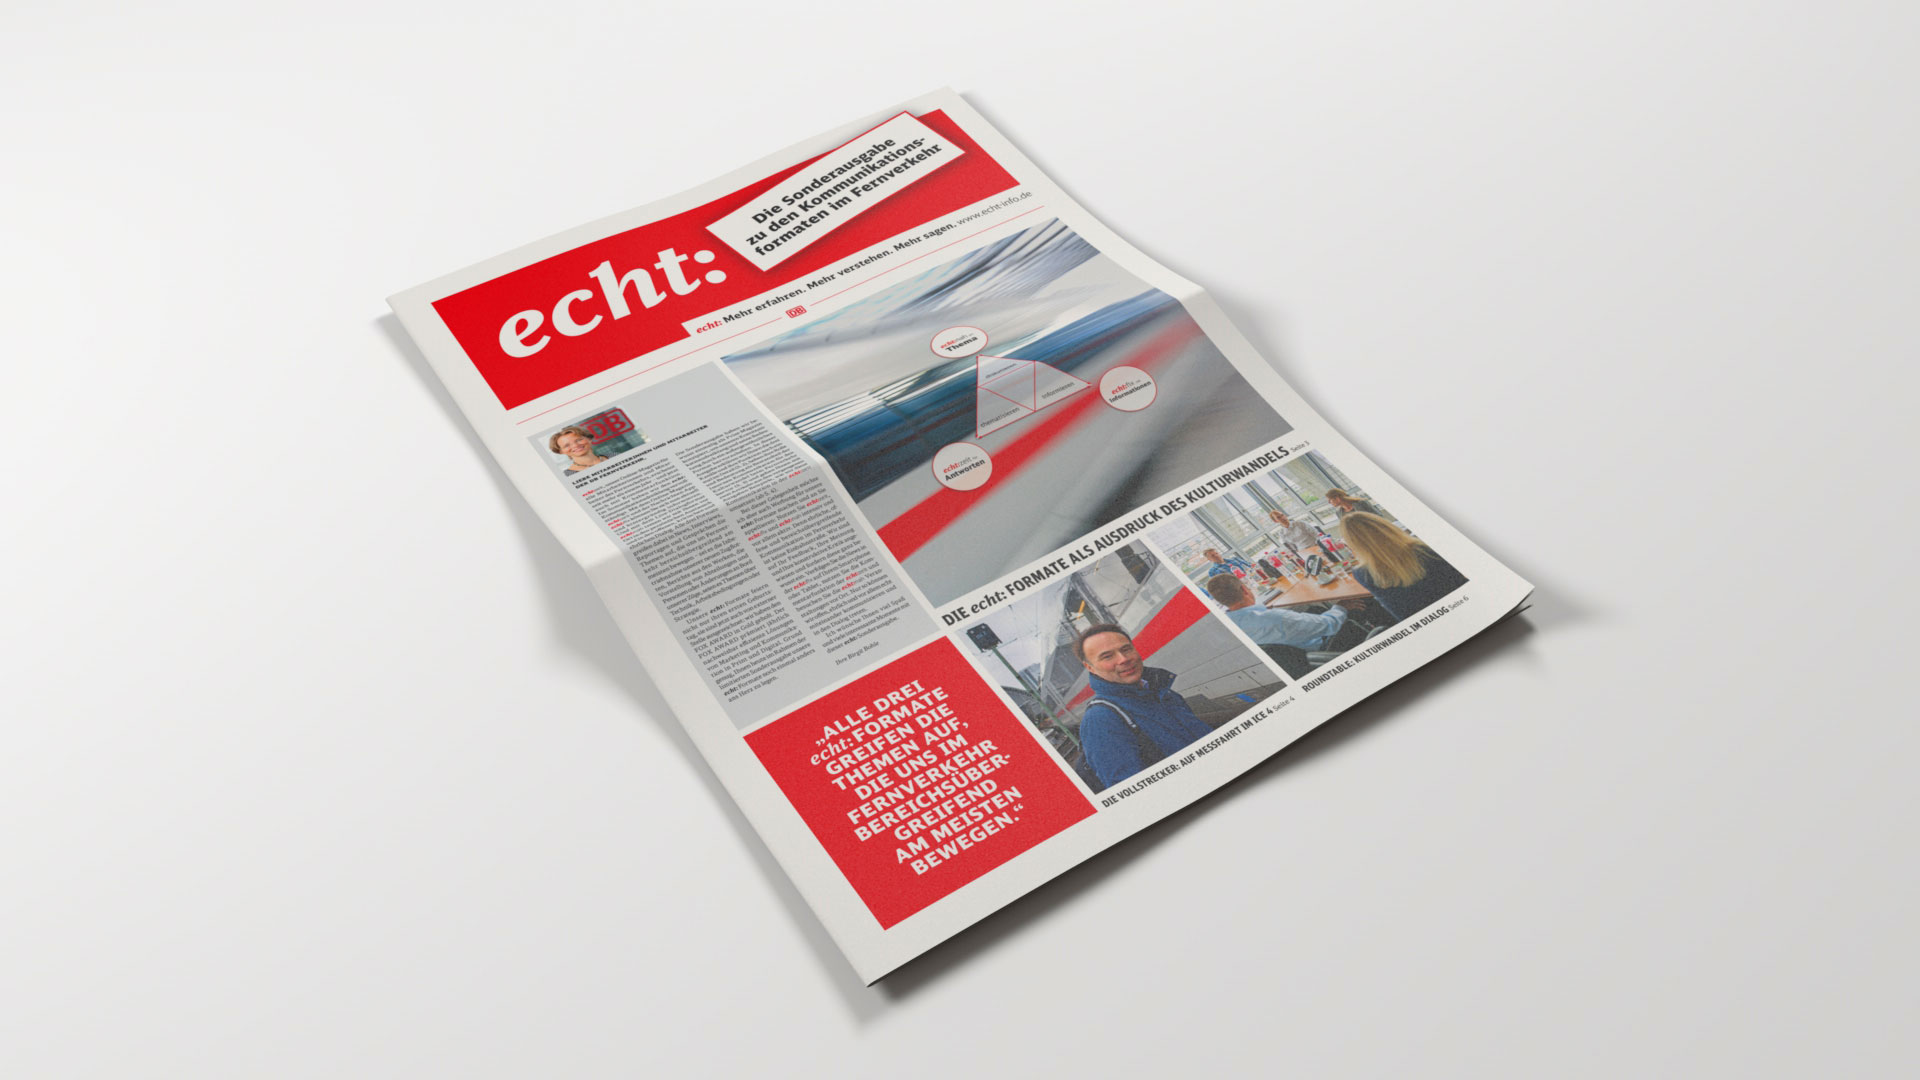 DB-Fernverkehr echt:zeit Zeitung